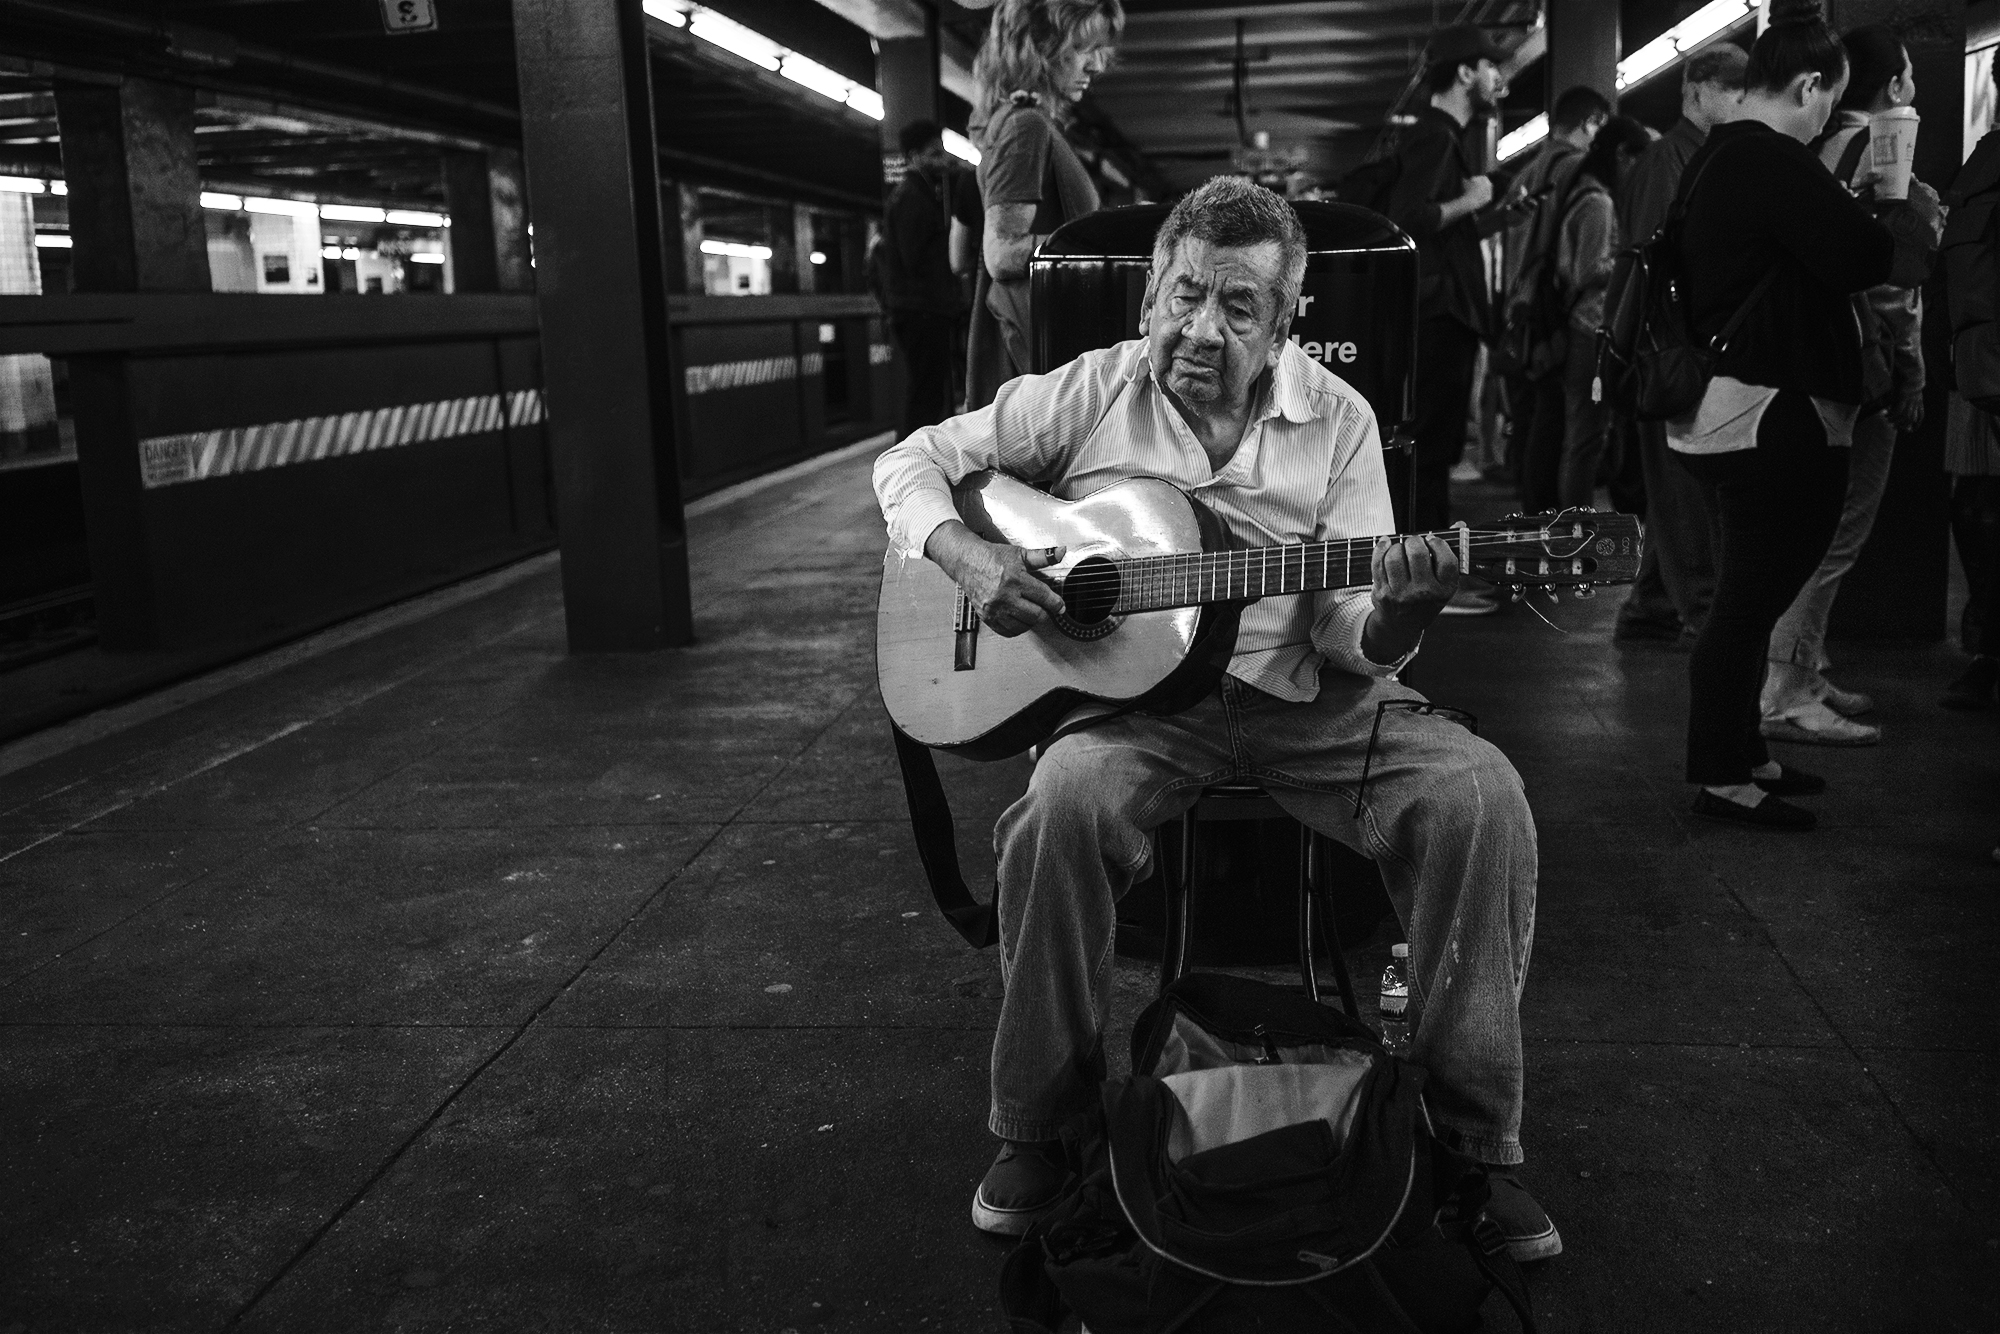 Brklyn_Subway_2018_Guitar_old_Man-038.jpg